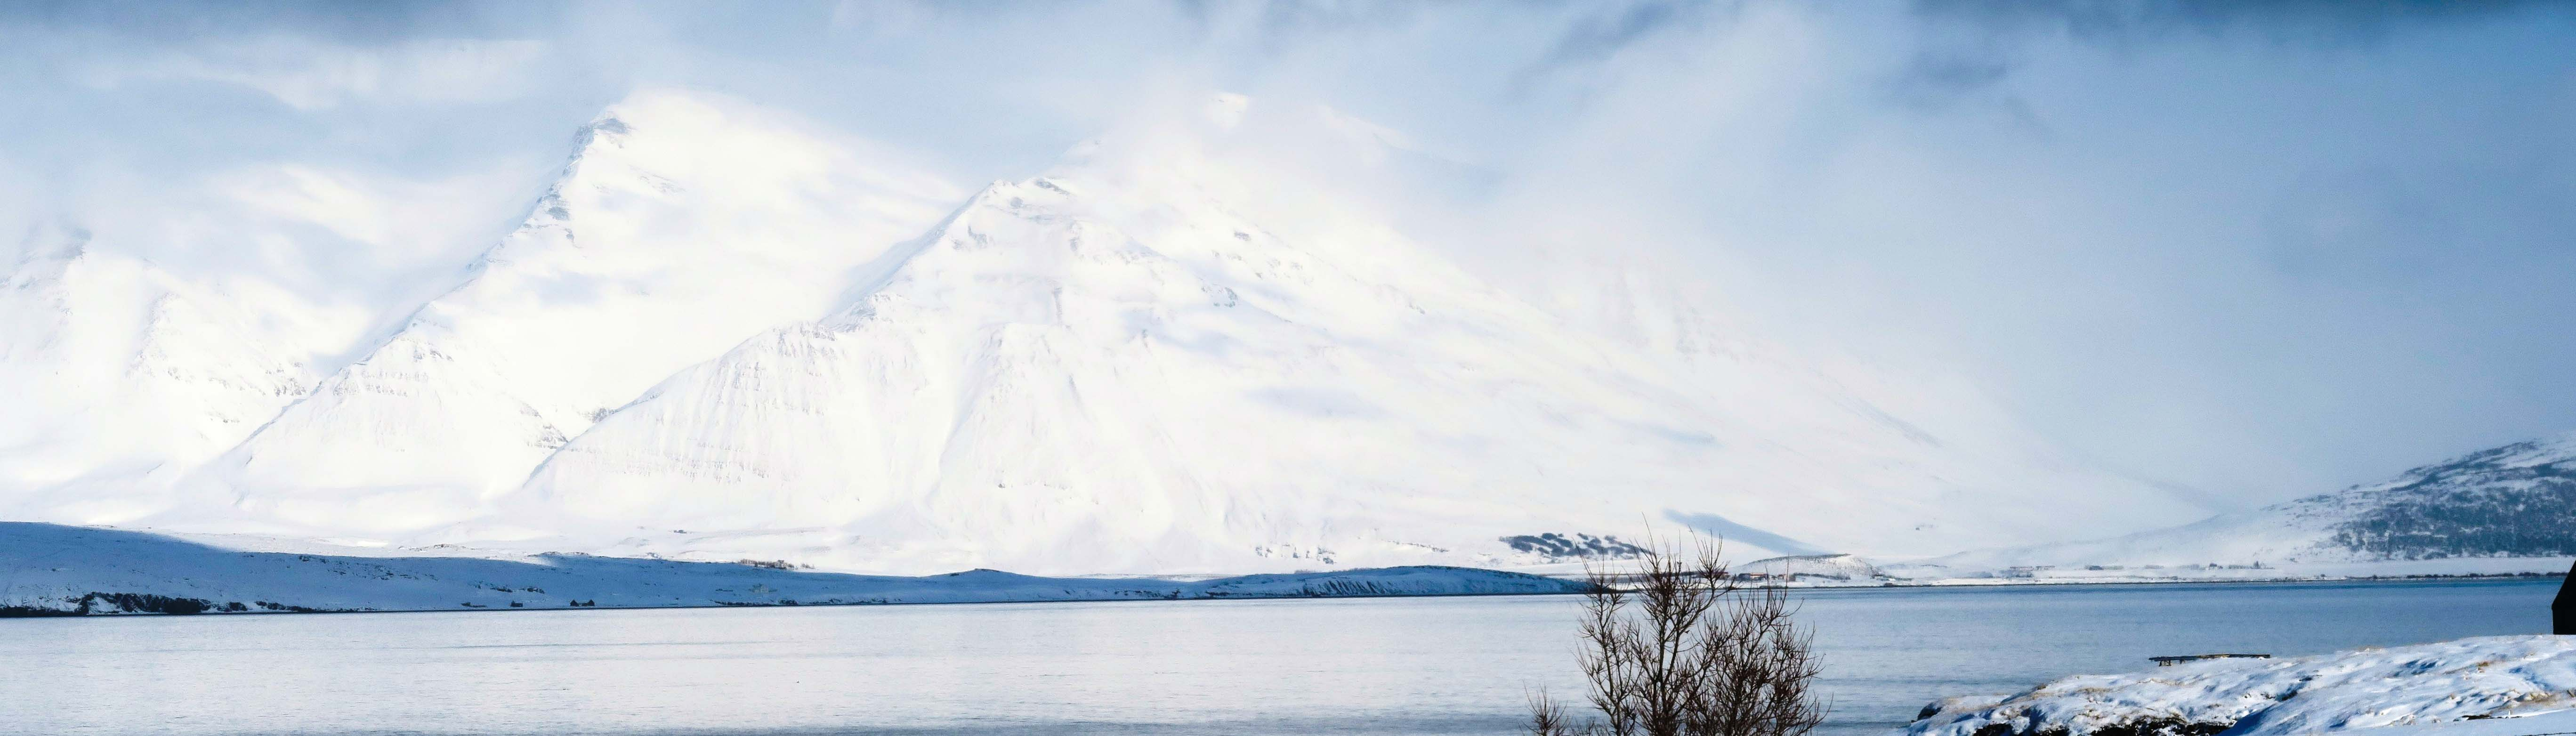 skitouren island, skitouren auf island, skitouring iceland,